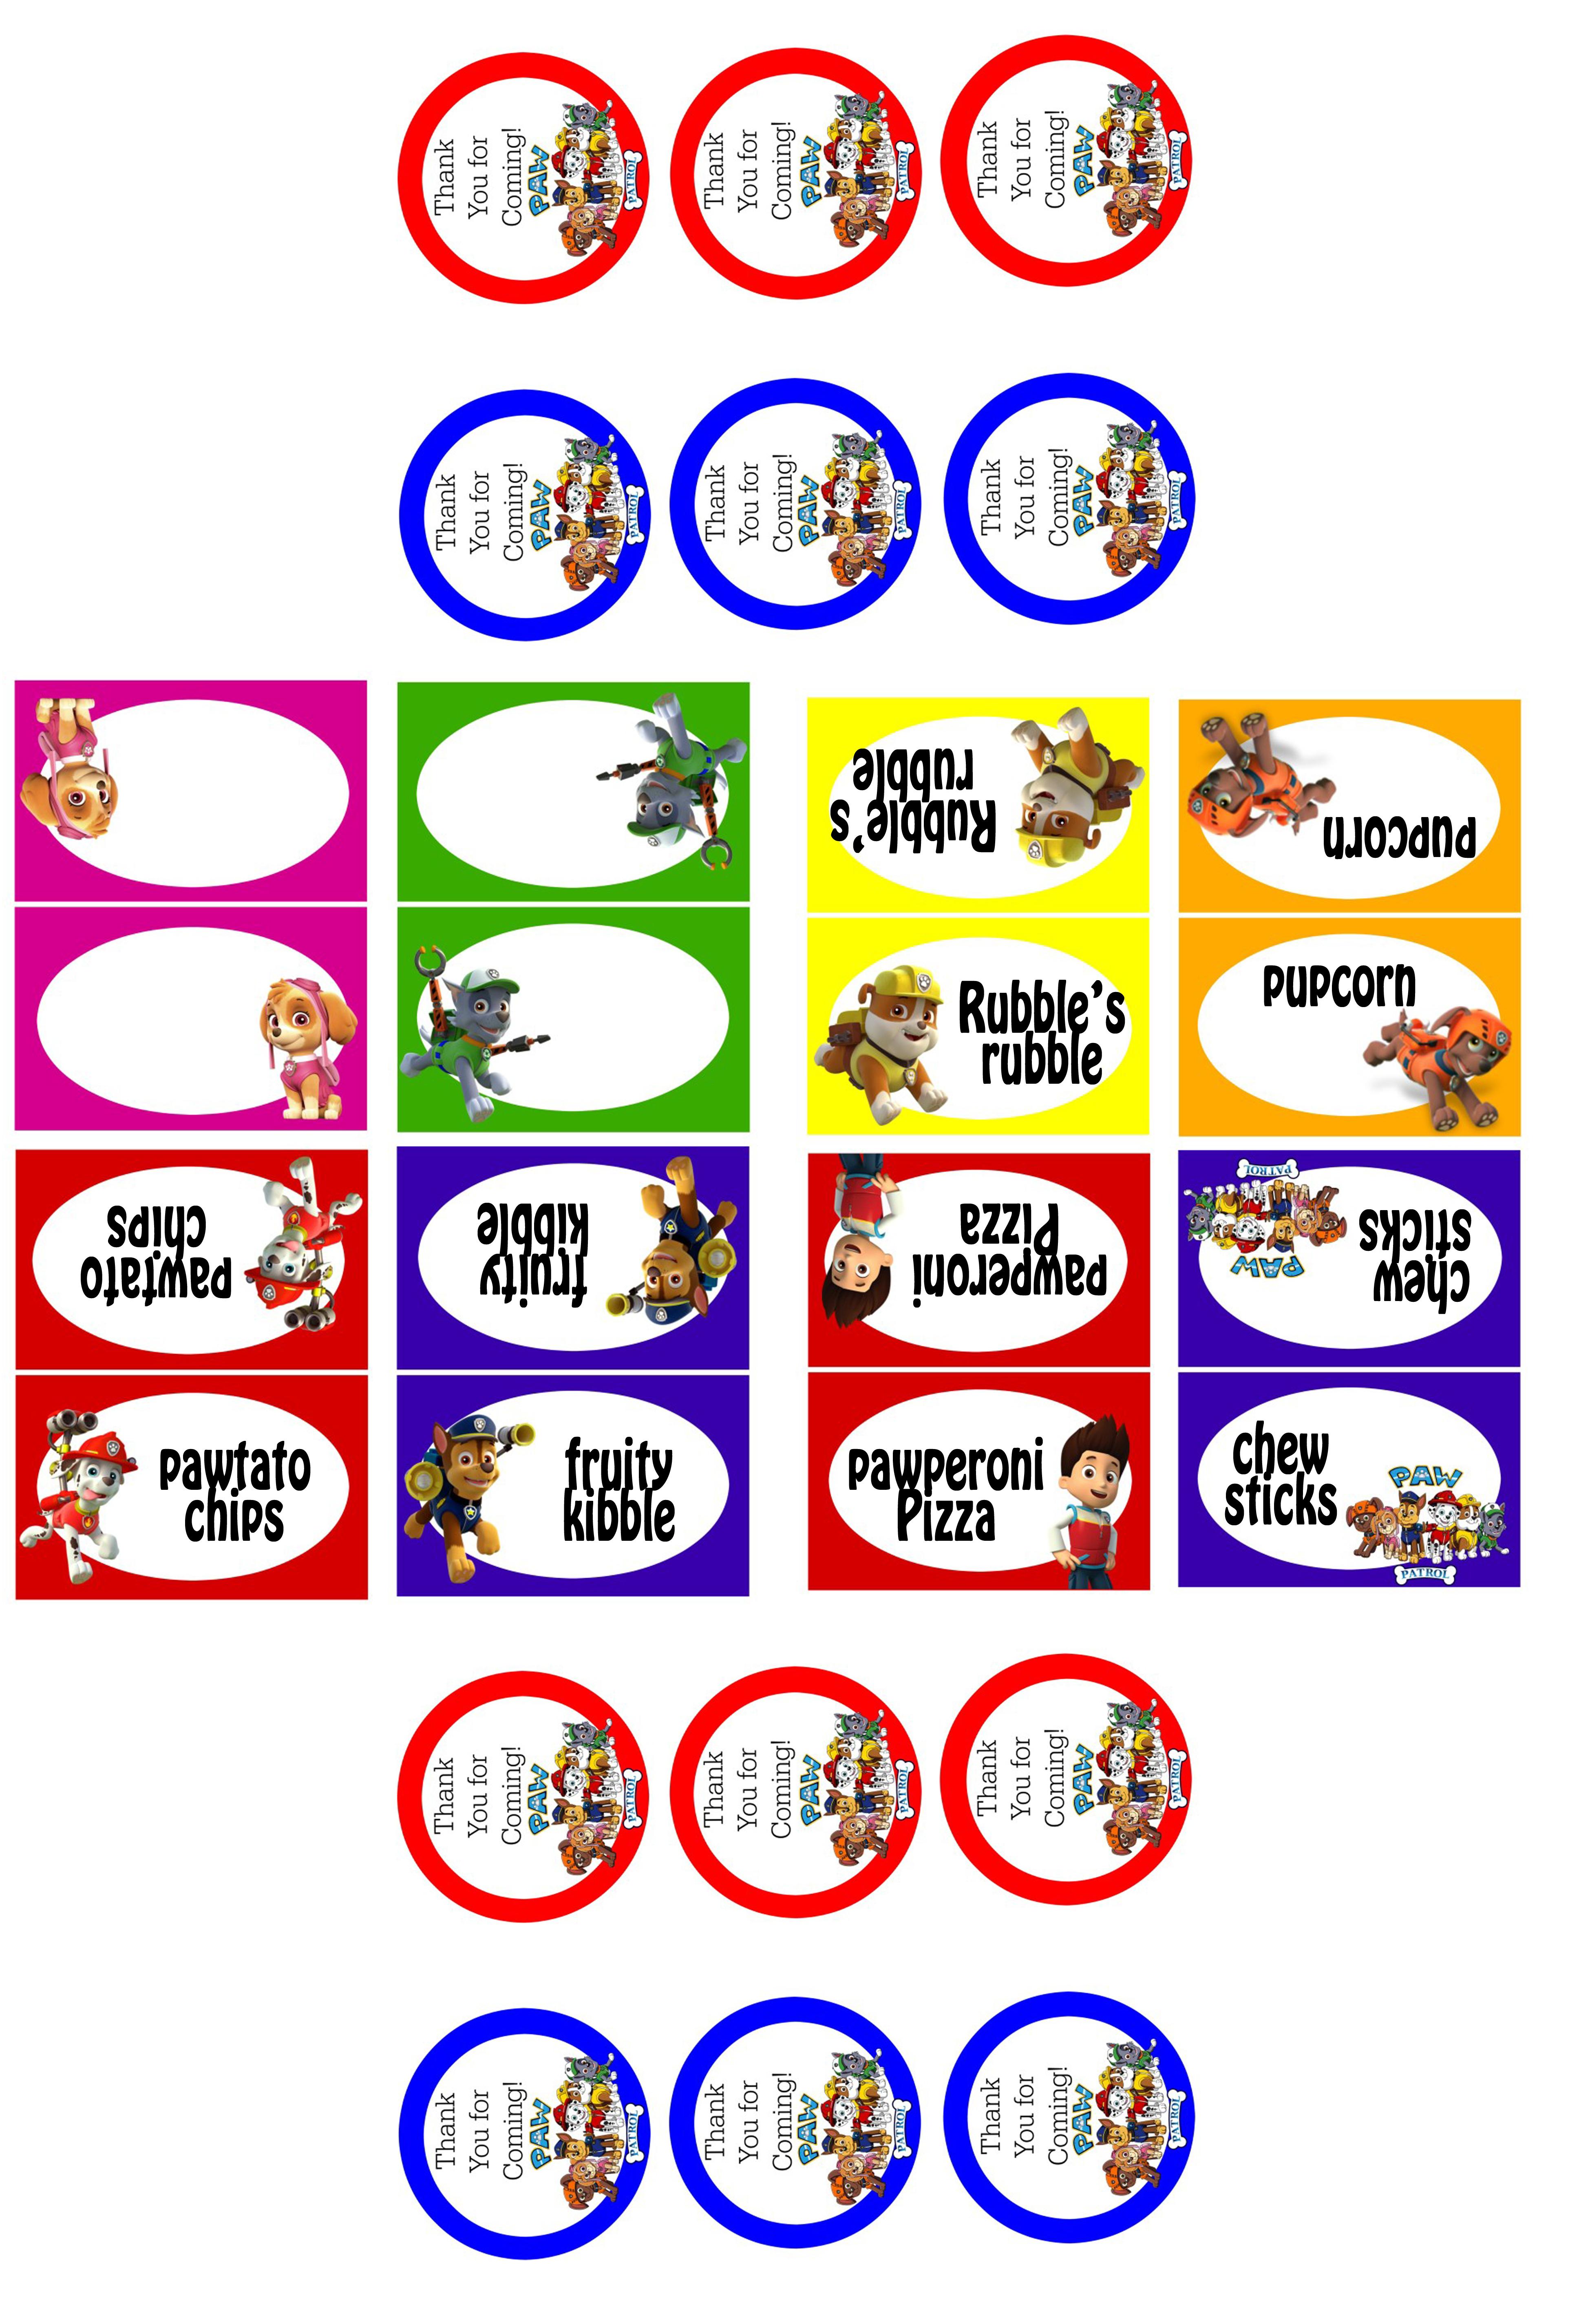 Lj's Paw Patrol Birthday Party - Bower Power - Free Printable Paw Patrol Food Labels